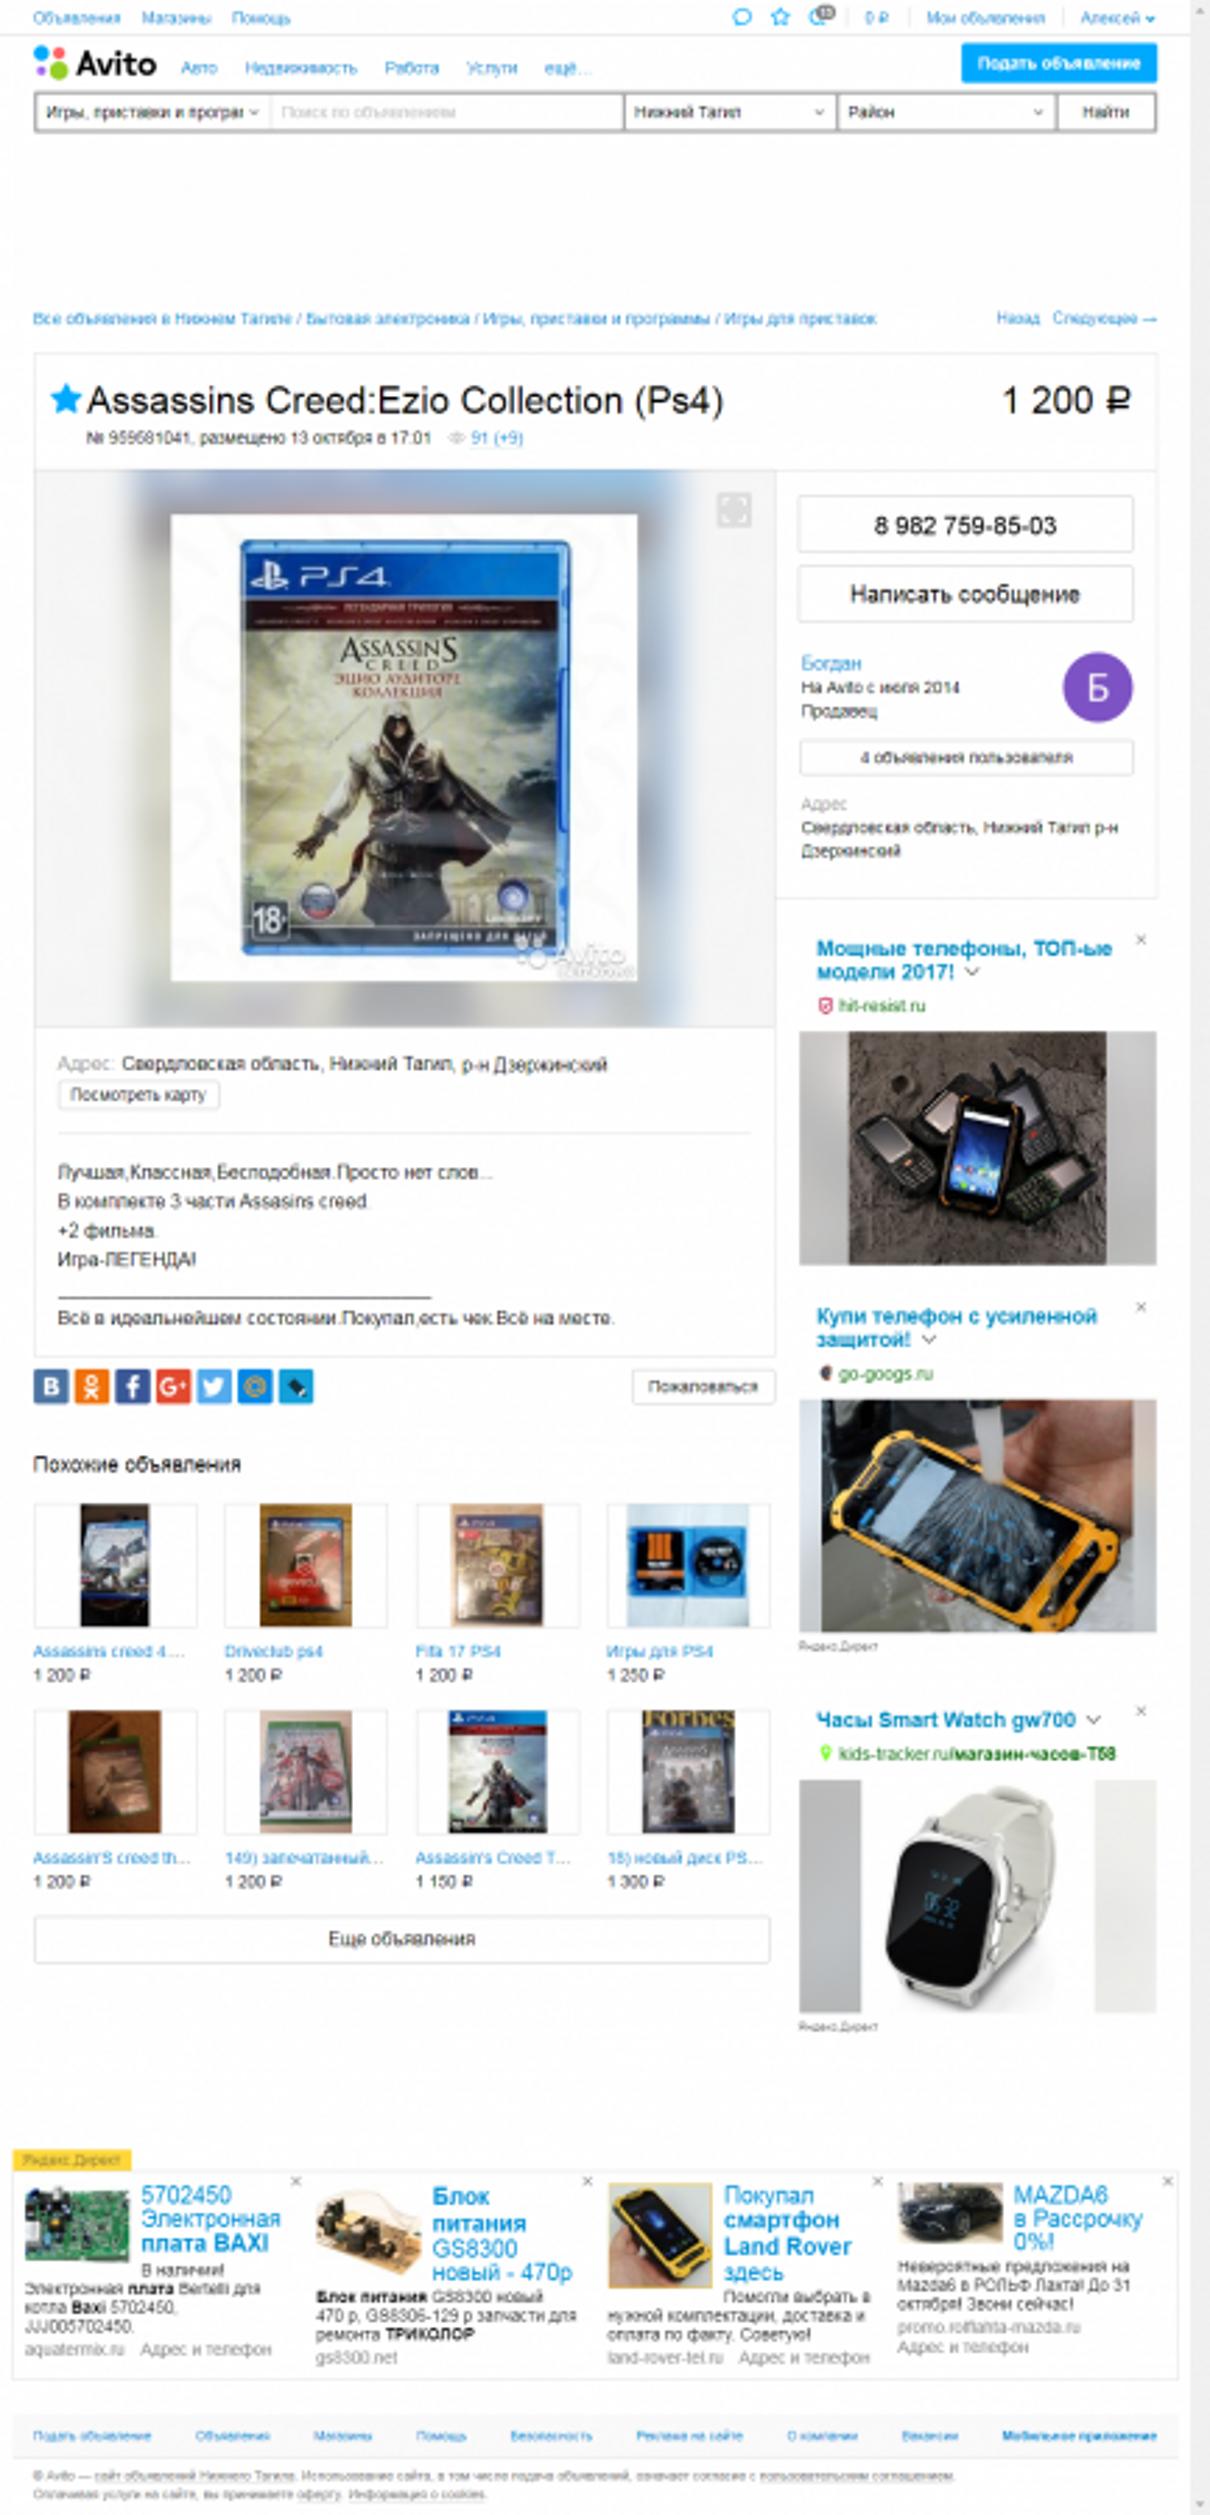 Жалоба-отзыв: Богдан - Не поиграл на PS4.  Фото №4